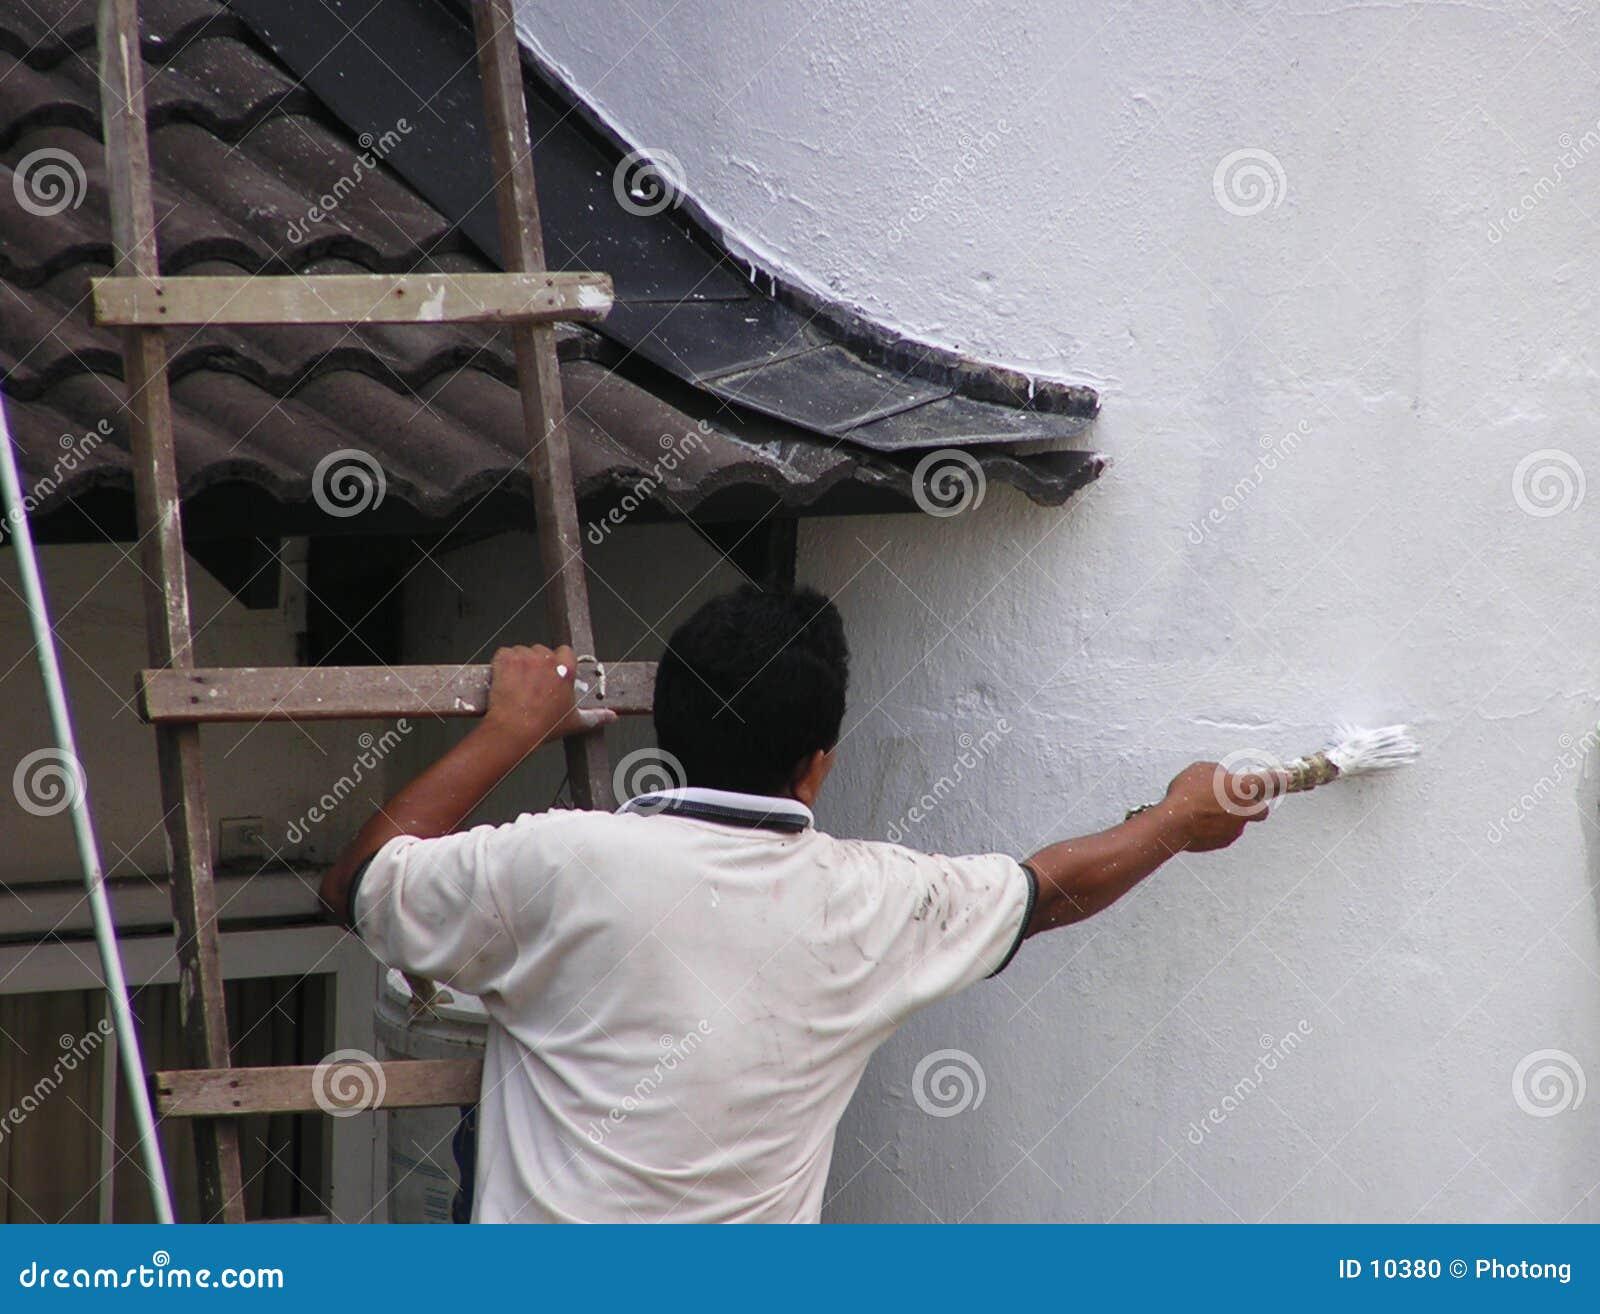 Man painting #2